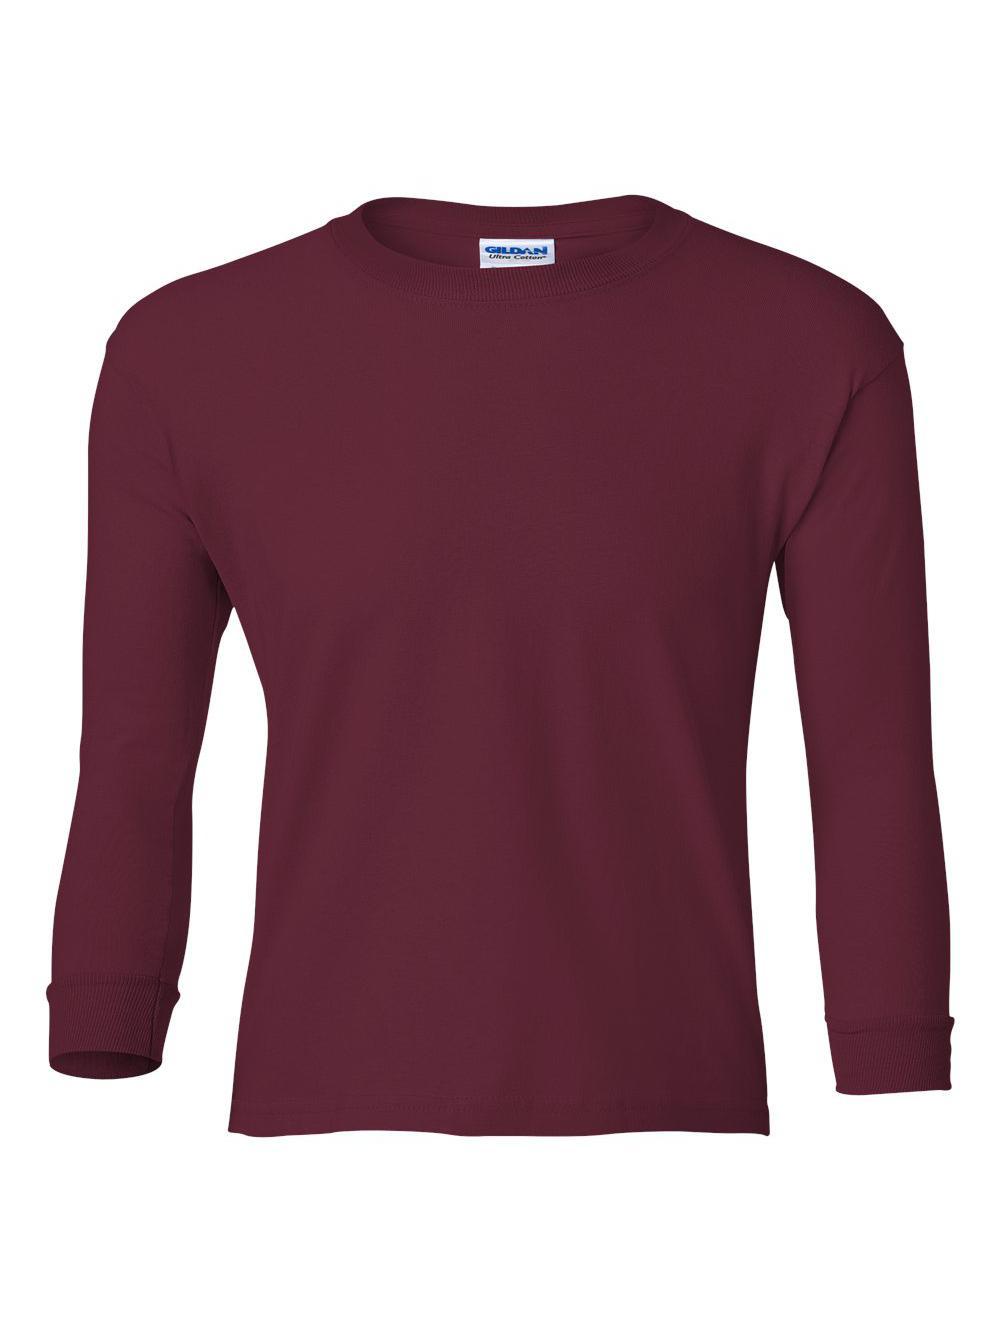 Gildan-Ultra-Cotton-Youth-Long-Sleeve-T-Shirt-2400B thumbnail 21